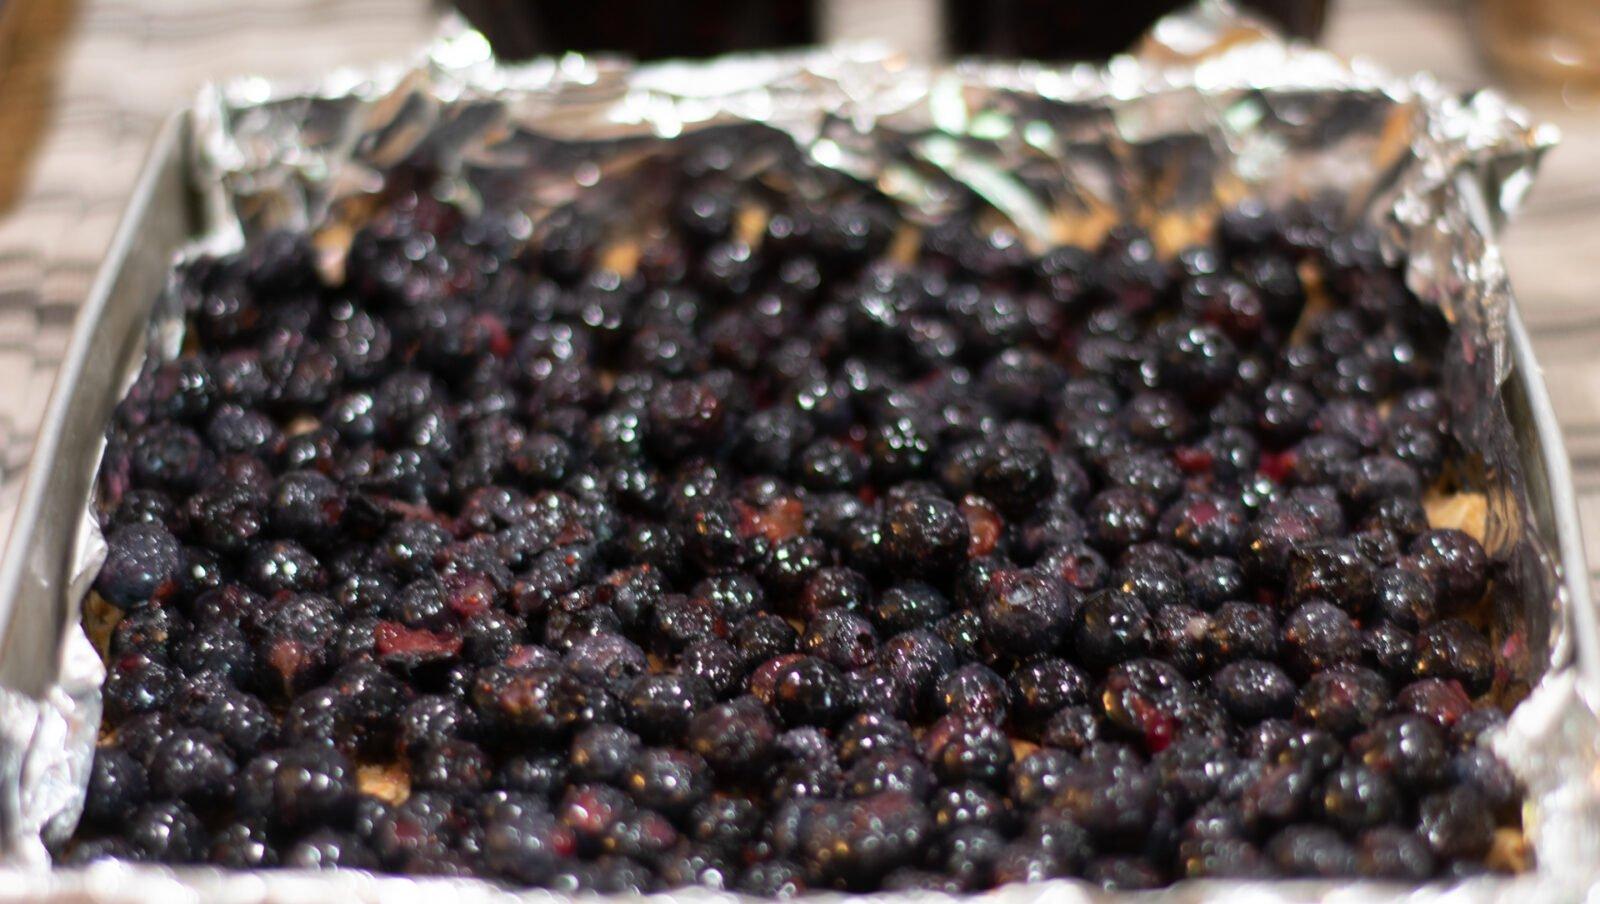 filling for blueberry oatmeal bars